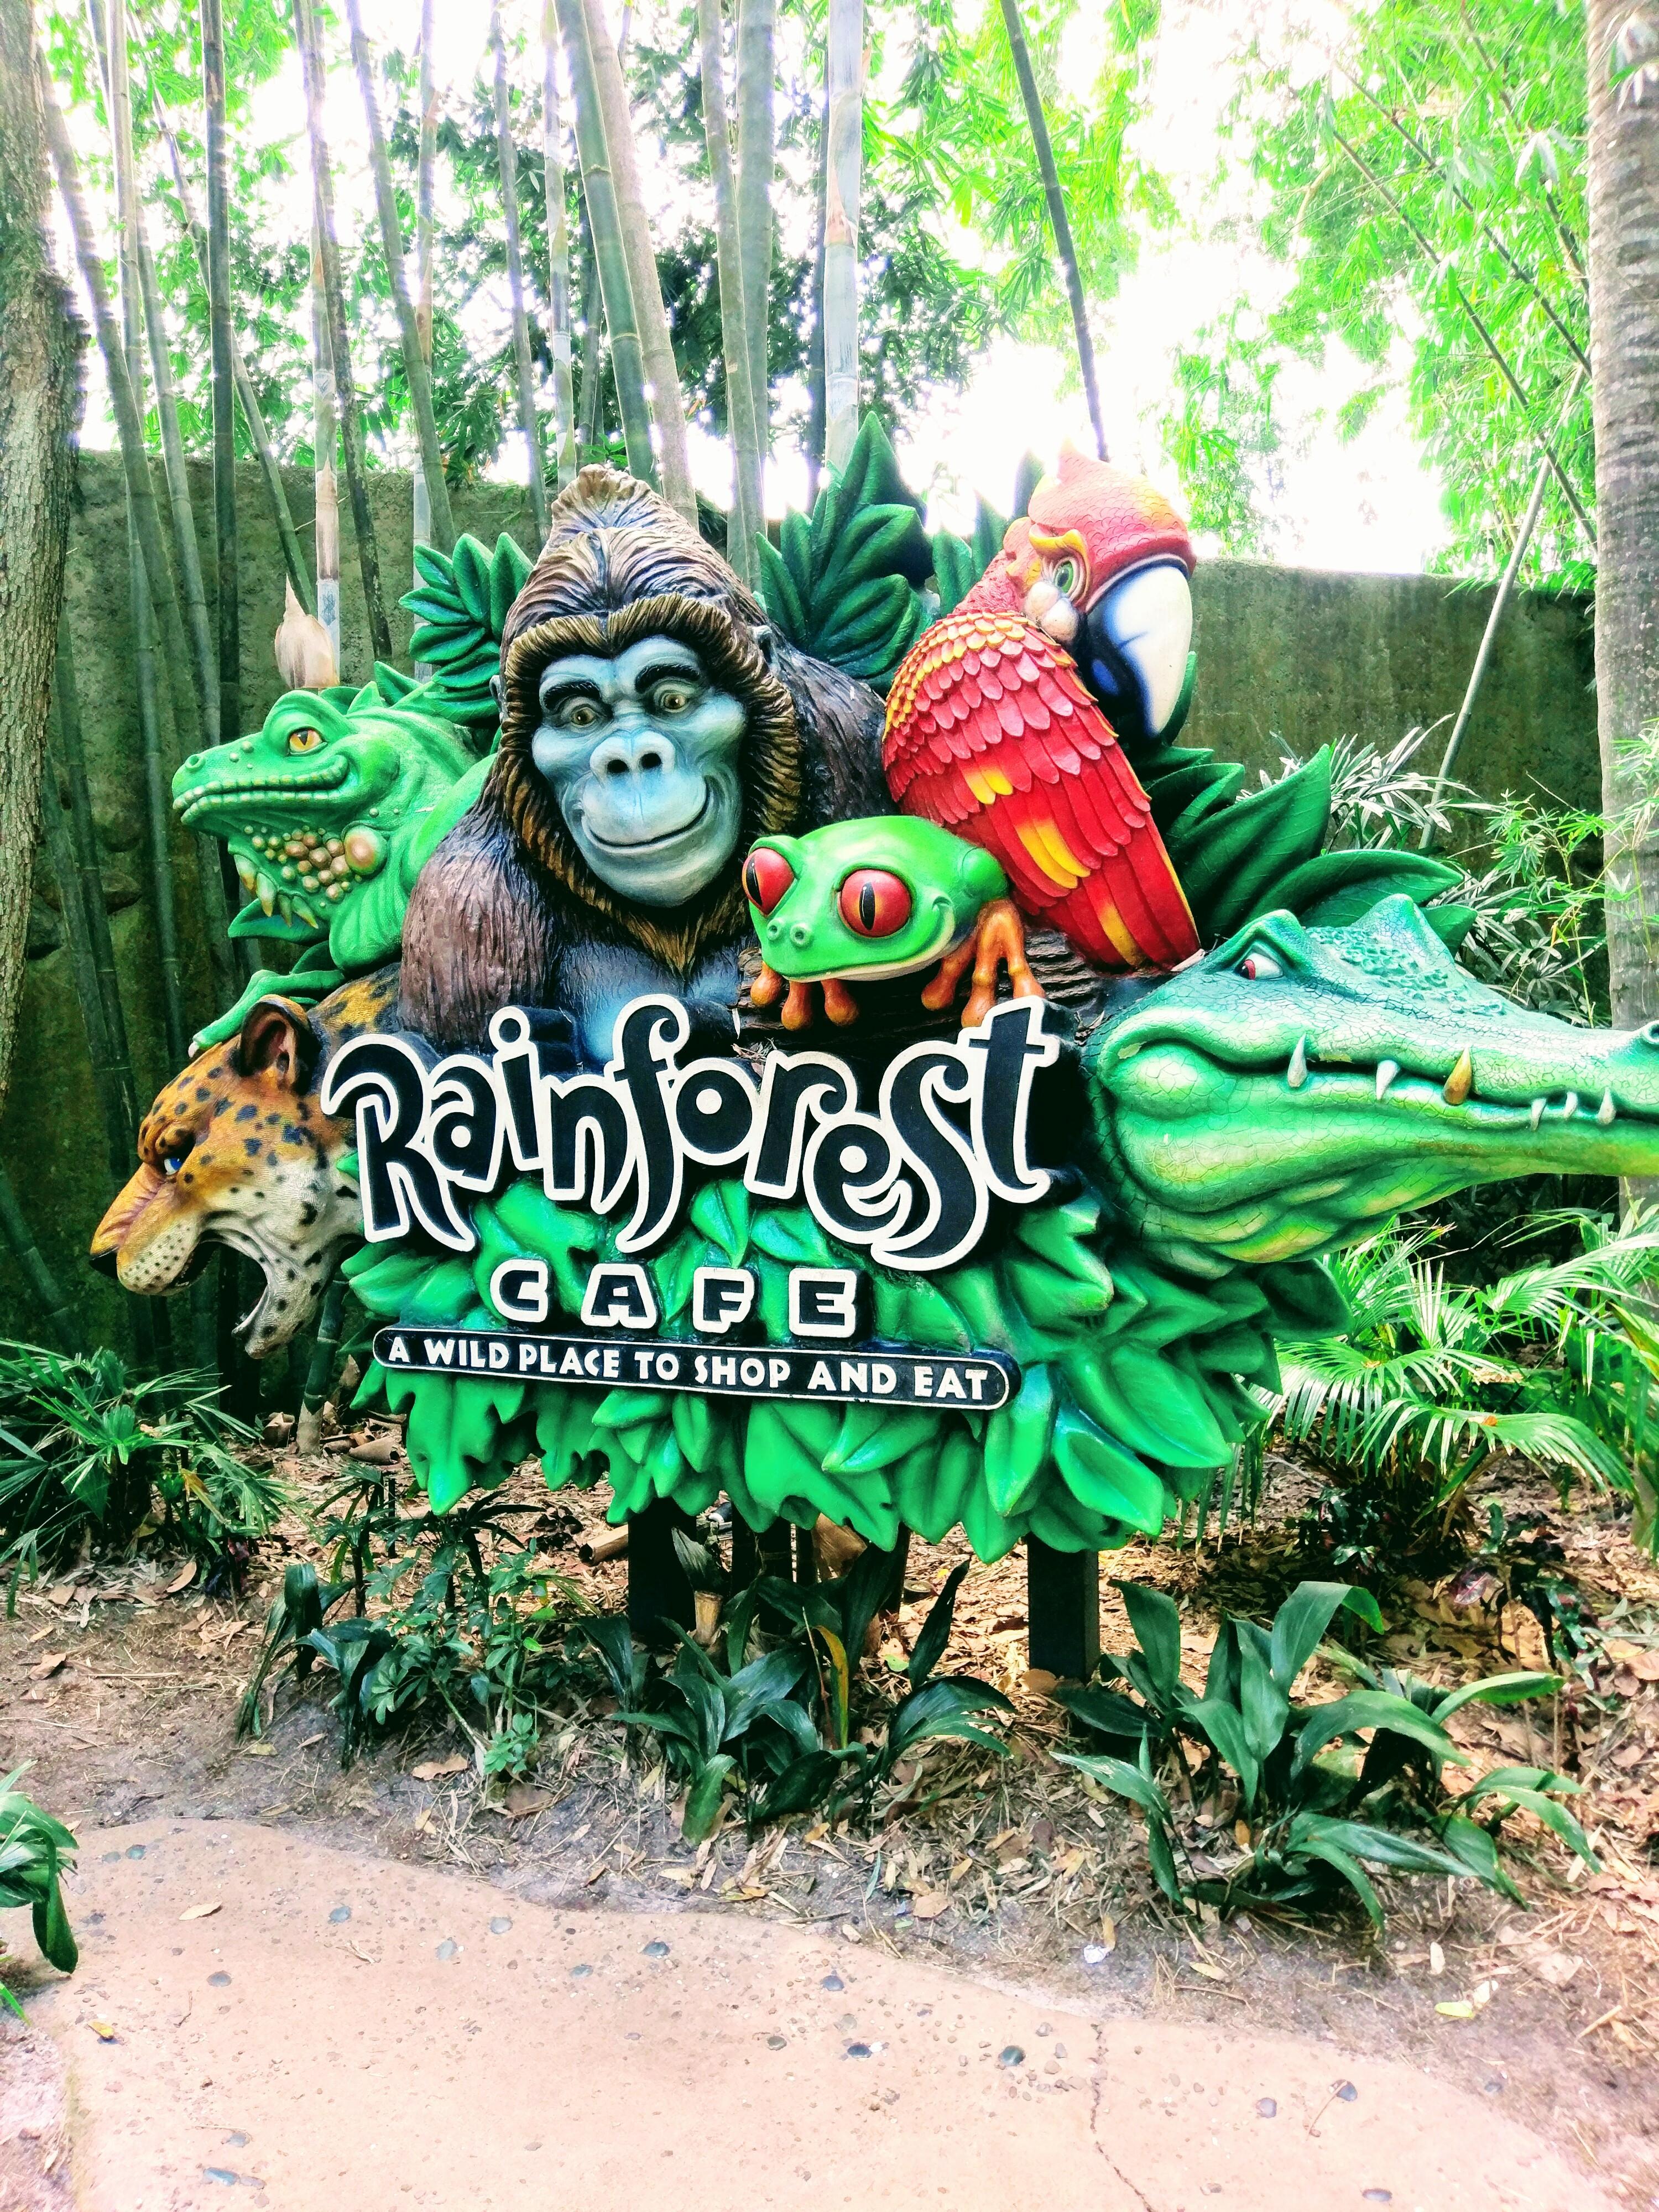 The Rainforest Cafe at Disney's Animal Kingdom.